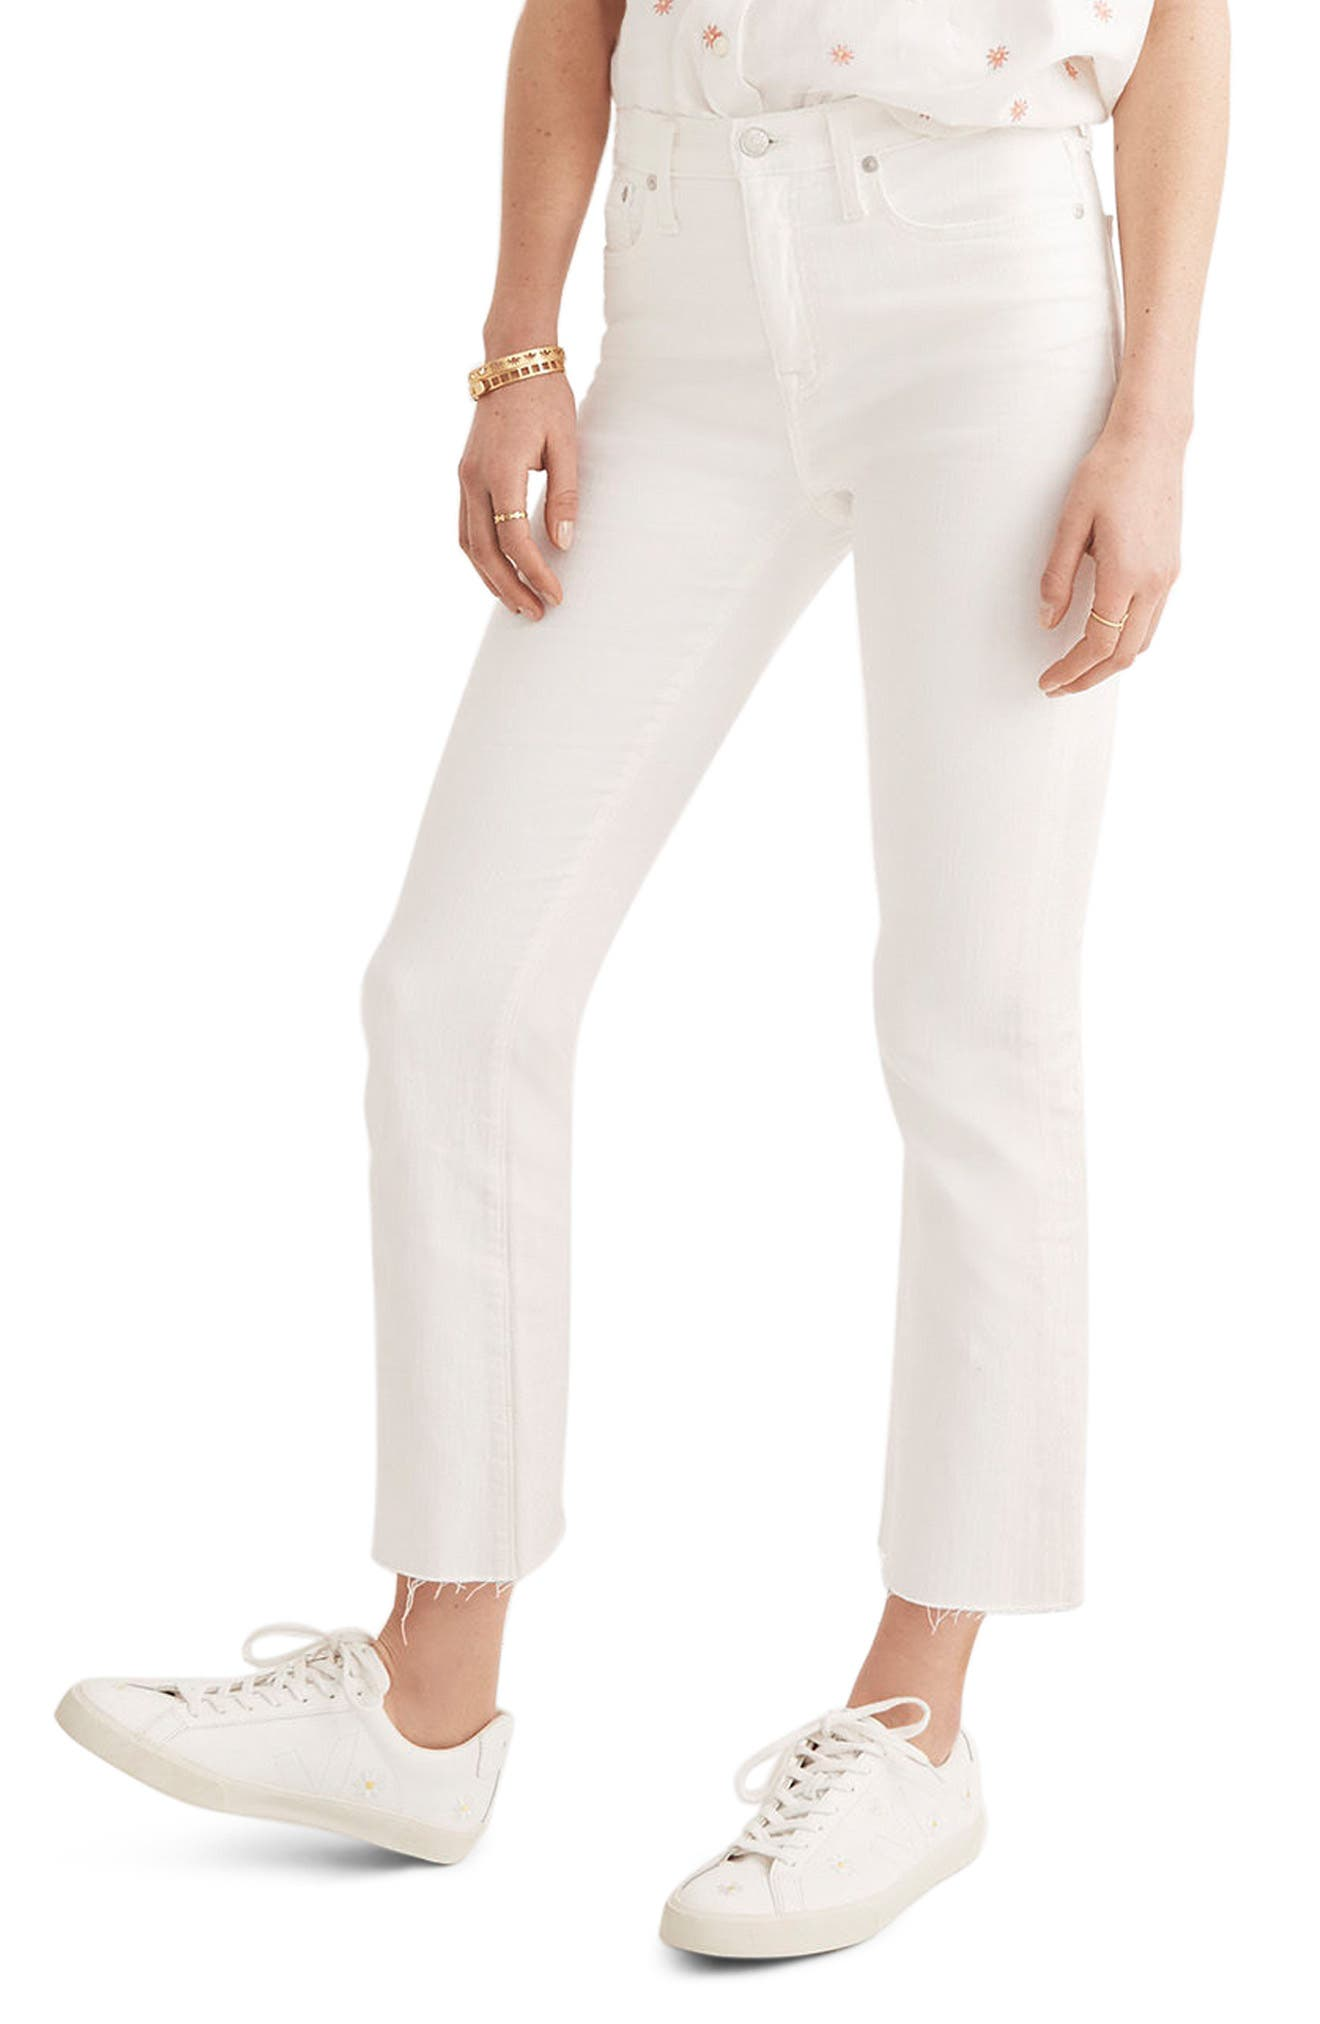 MADEWELL, Cali Raw Edge Demi Boot Jeans, Main thumbnail 1, color, PURE WHITE